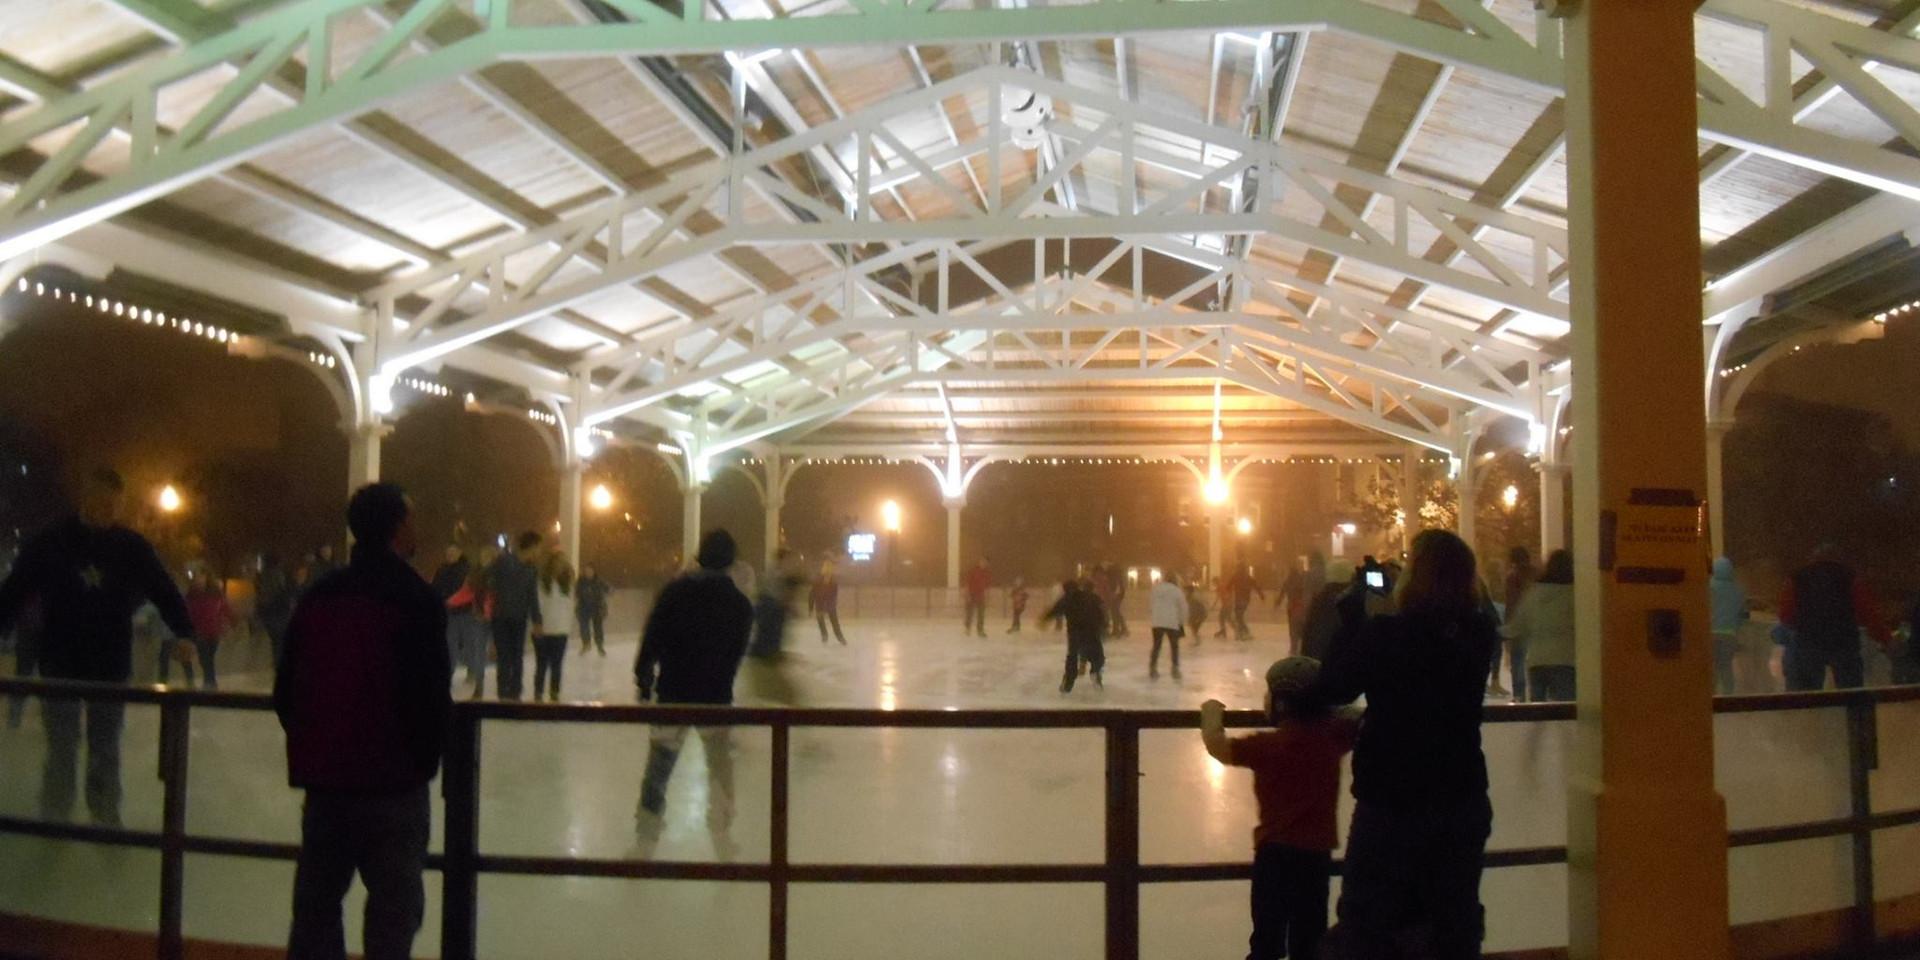 Harris Ice Pavilion